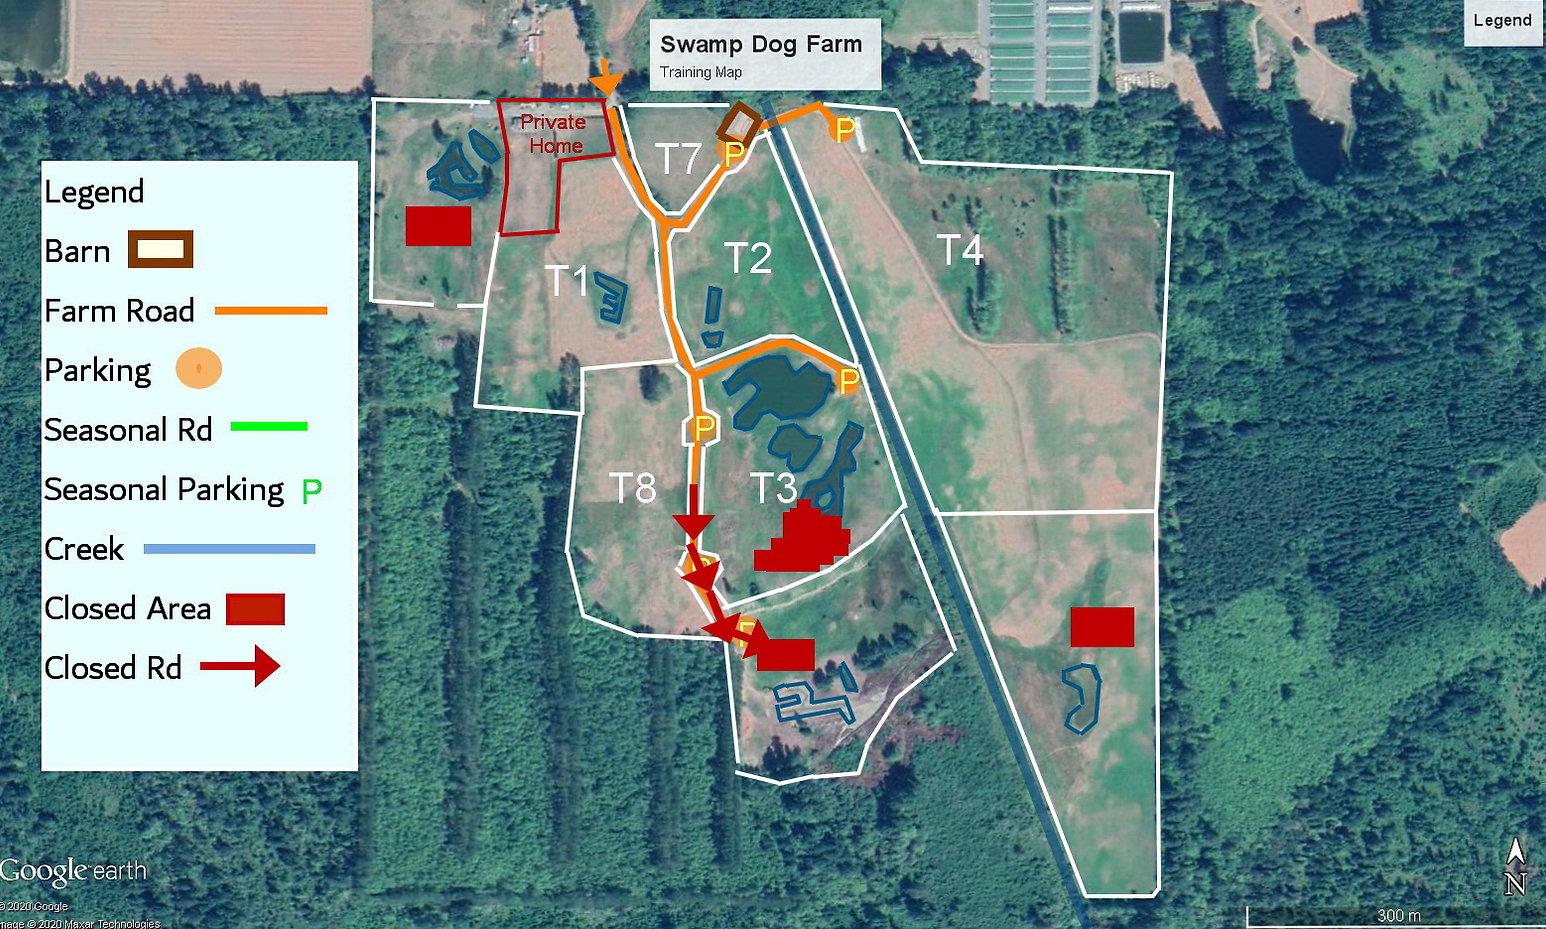 Swamp Dog Farm Winter Training Map2020.j